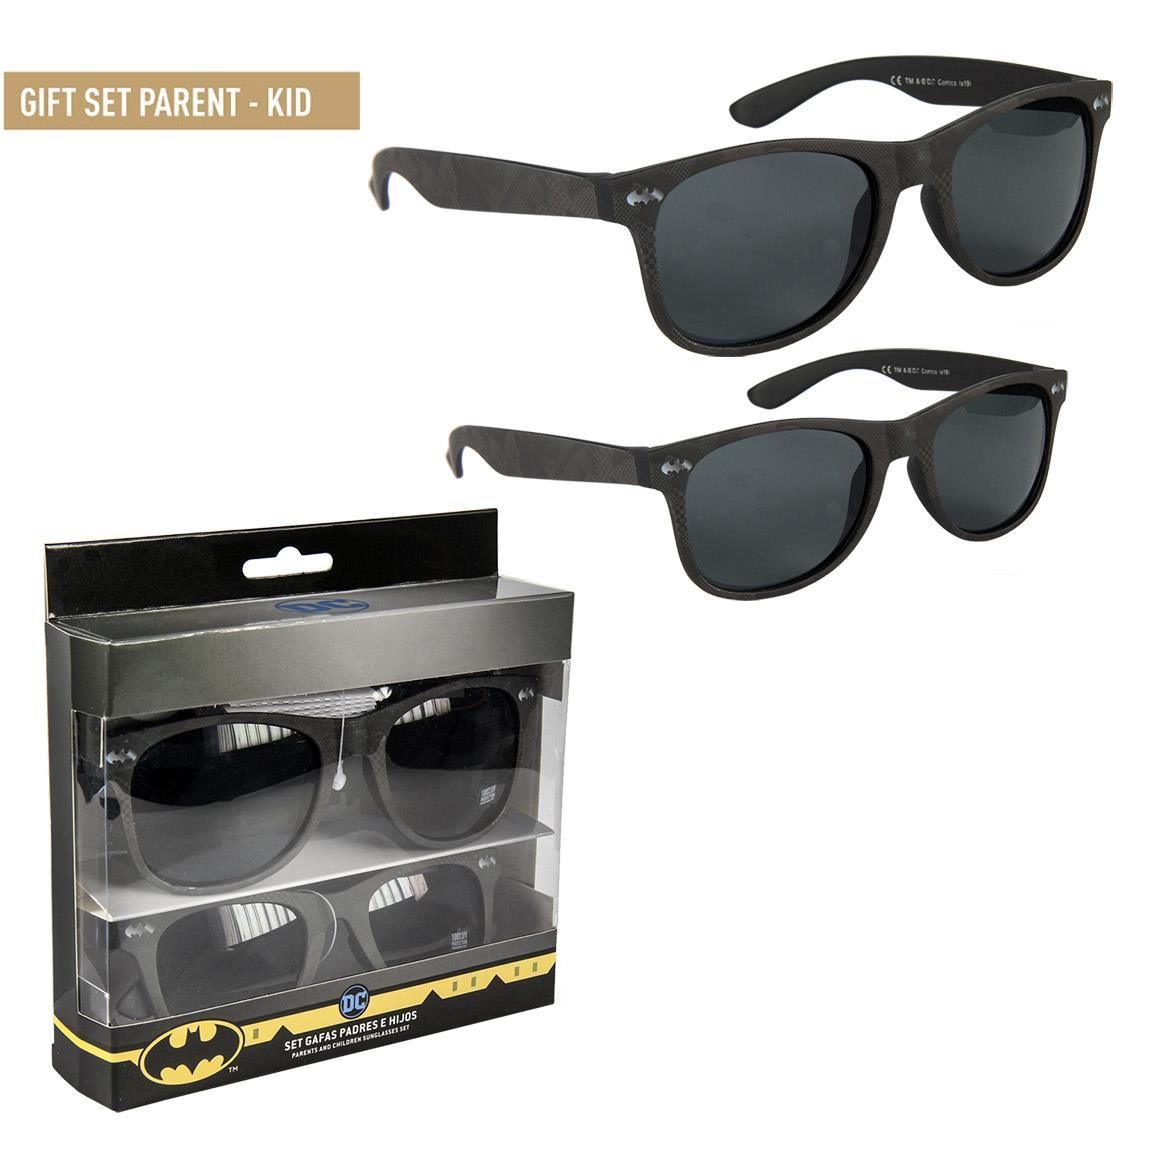 7809342072 Manufacturer and wholesaler of SUNGLASSES BOX SET BATMAN - CERDÁ